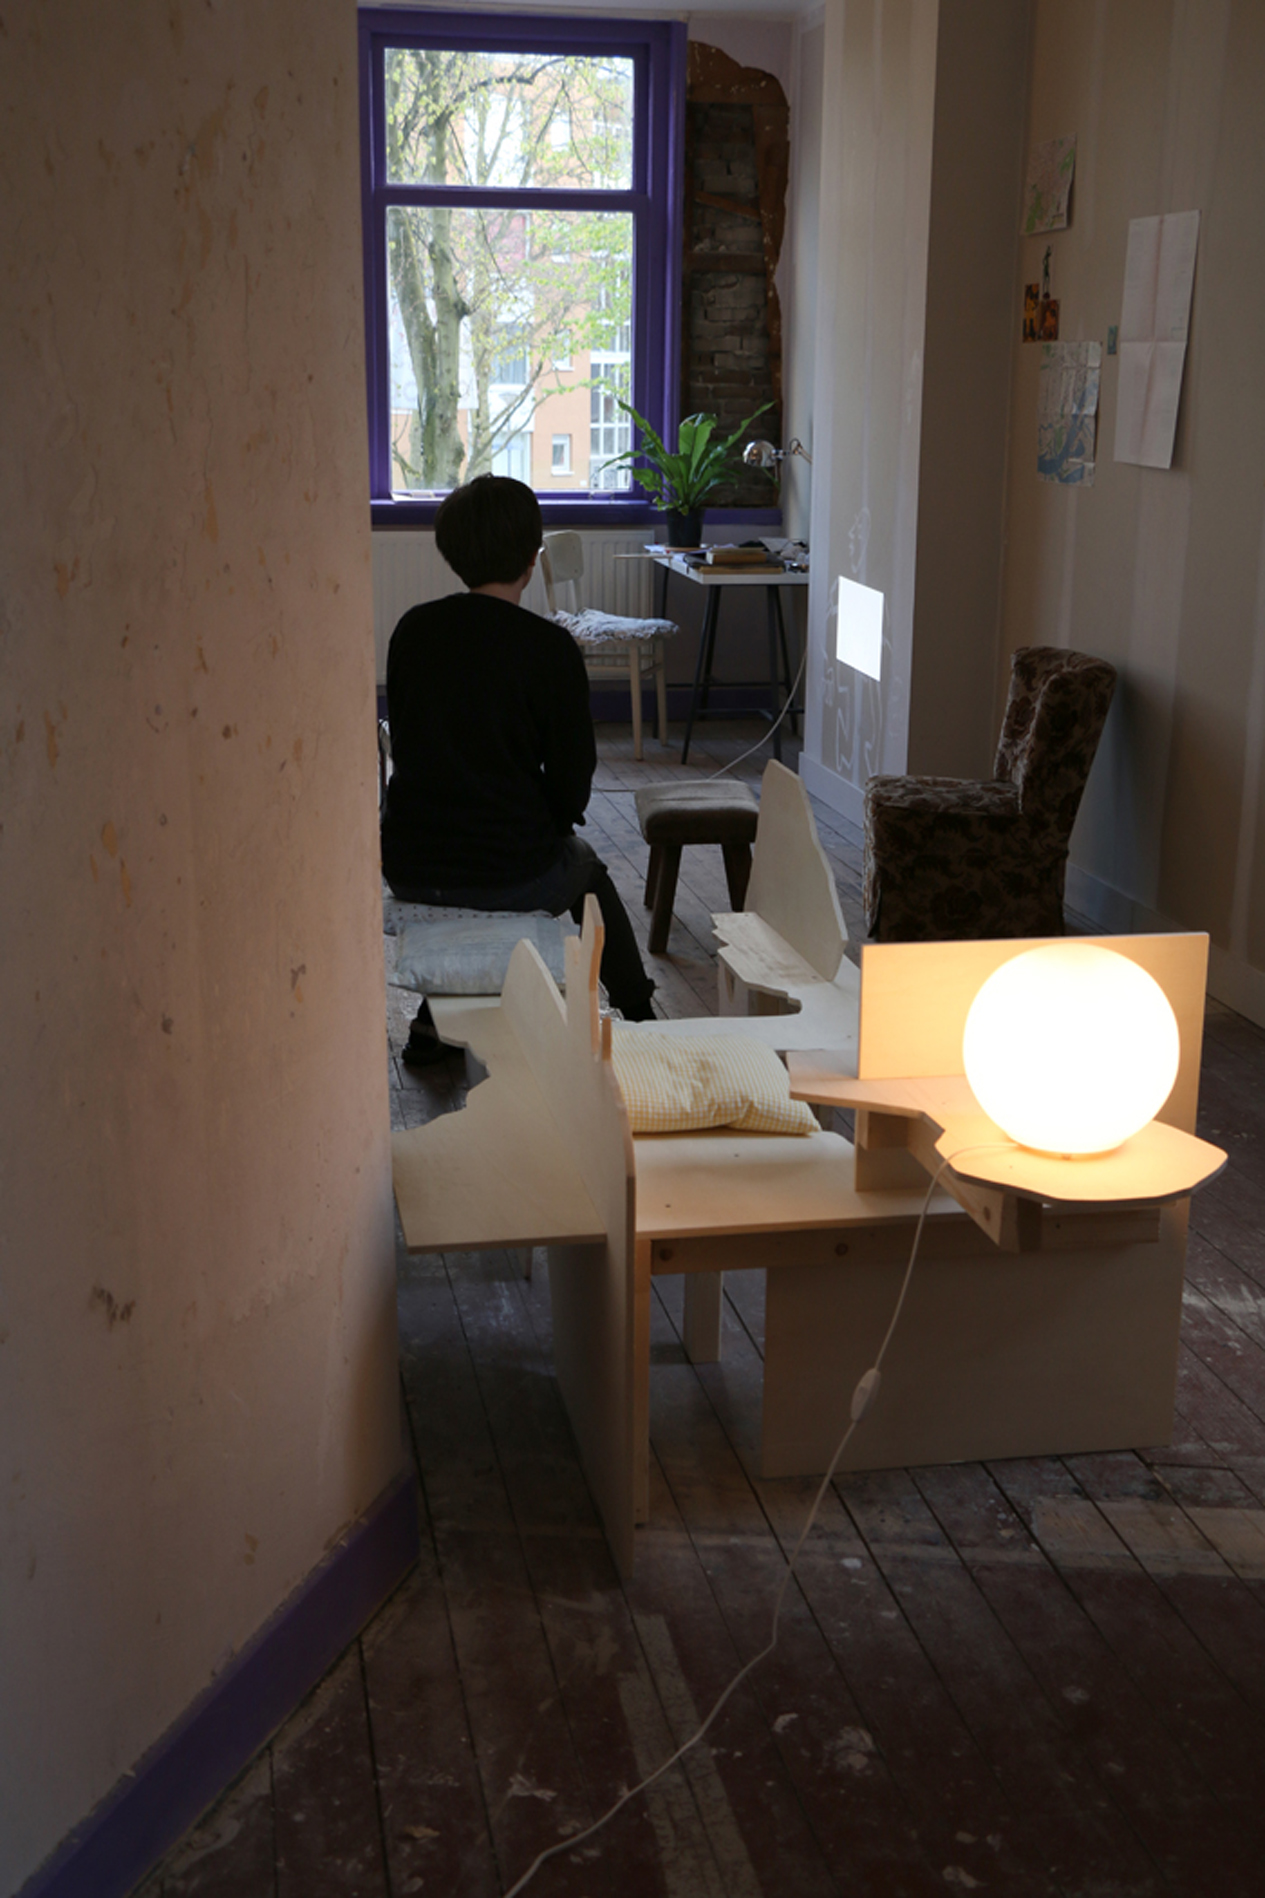 loungewear for text on method.jpg